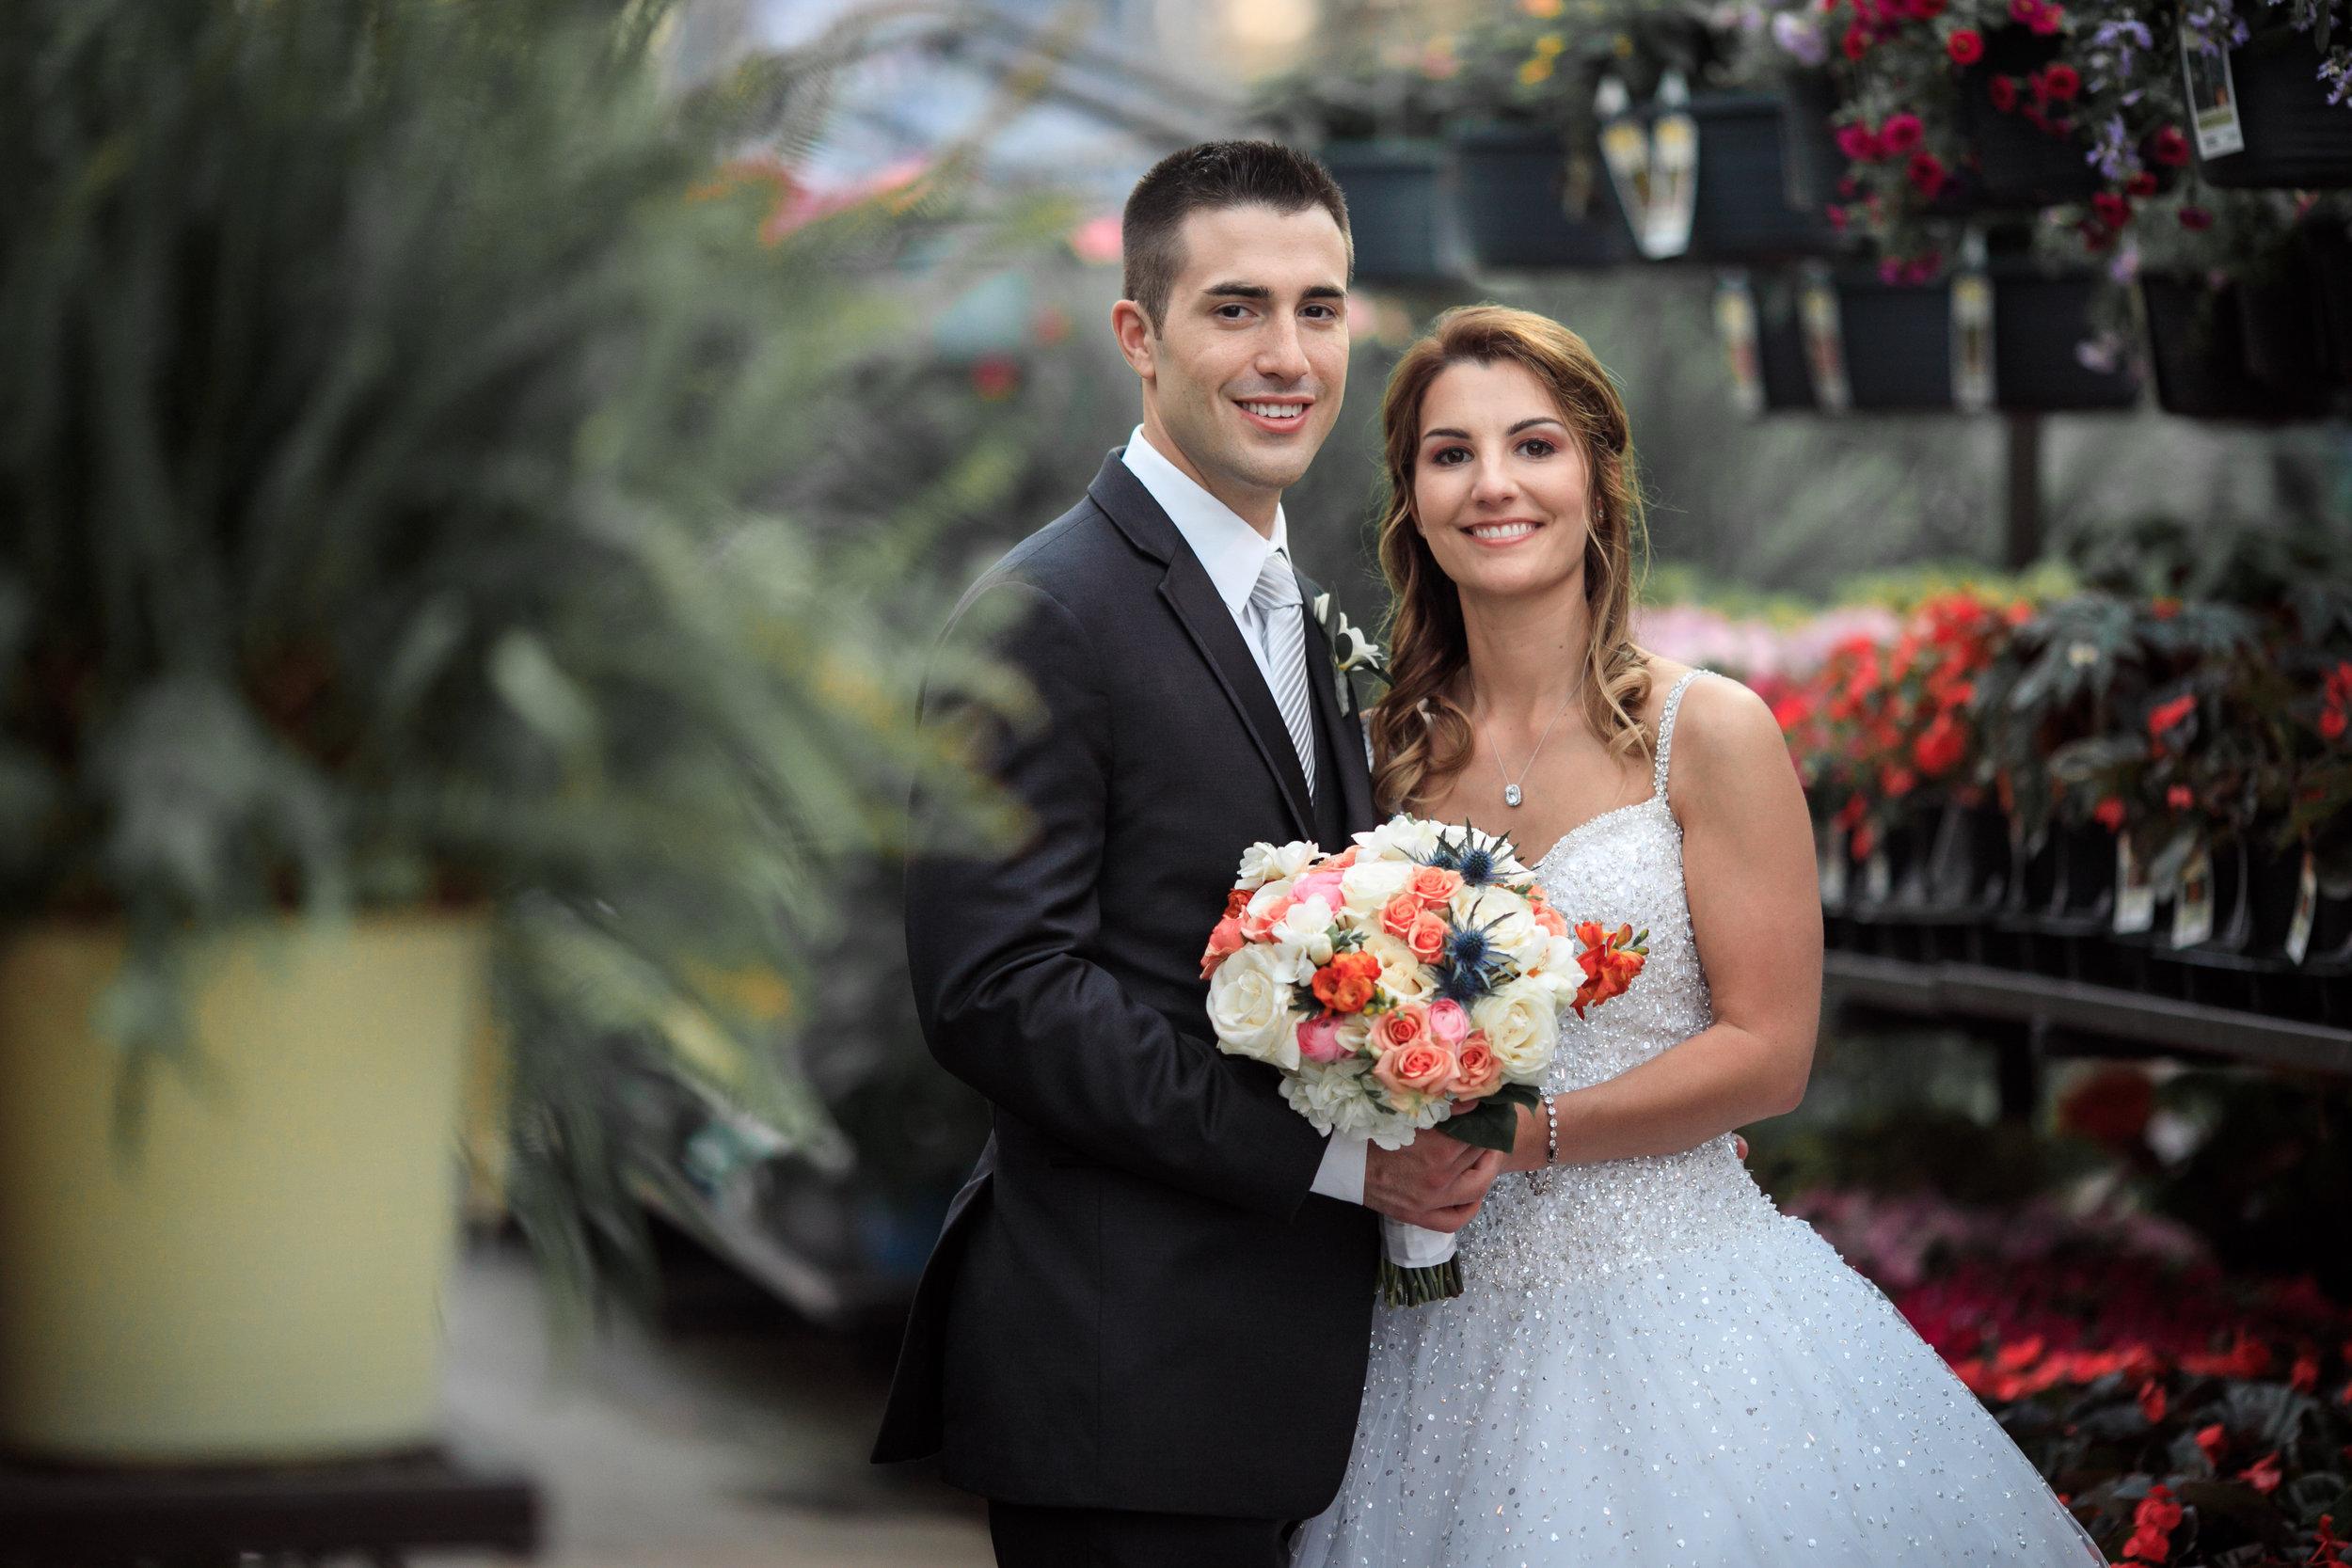 Wedding-couple-takes-photos-at-lowes-hardware-due-to-rain18.jpg